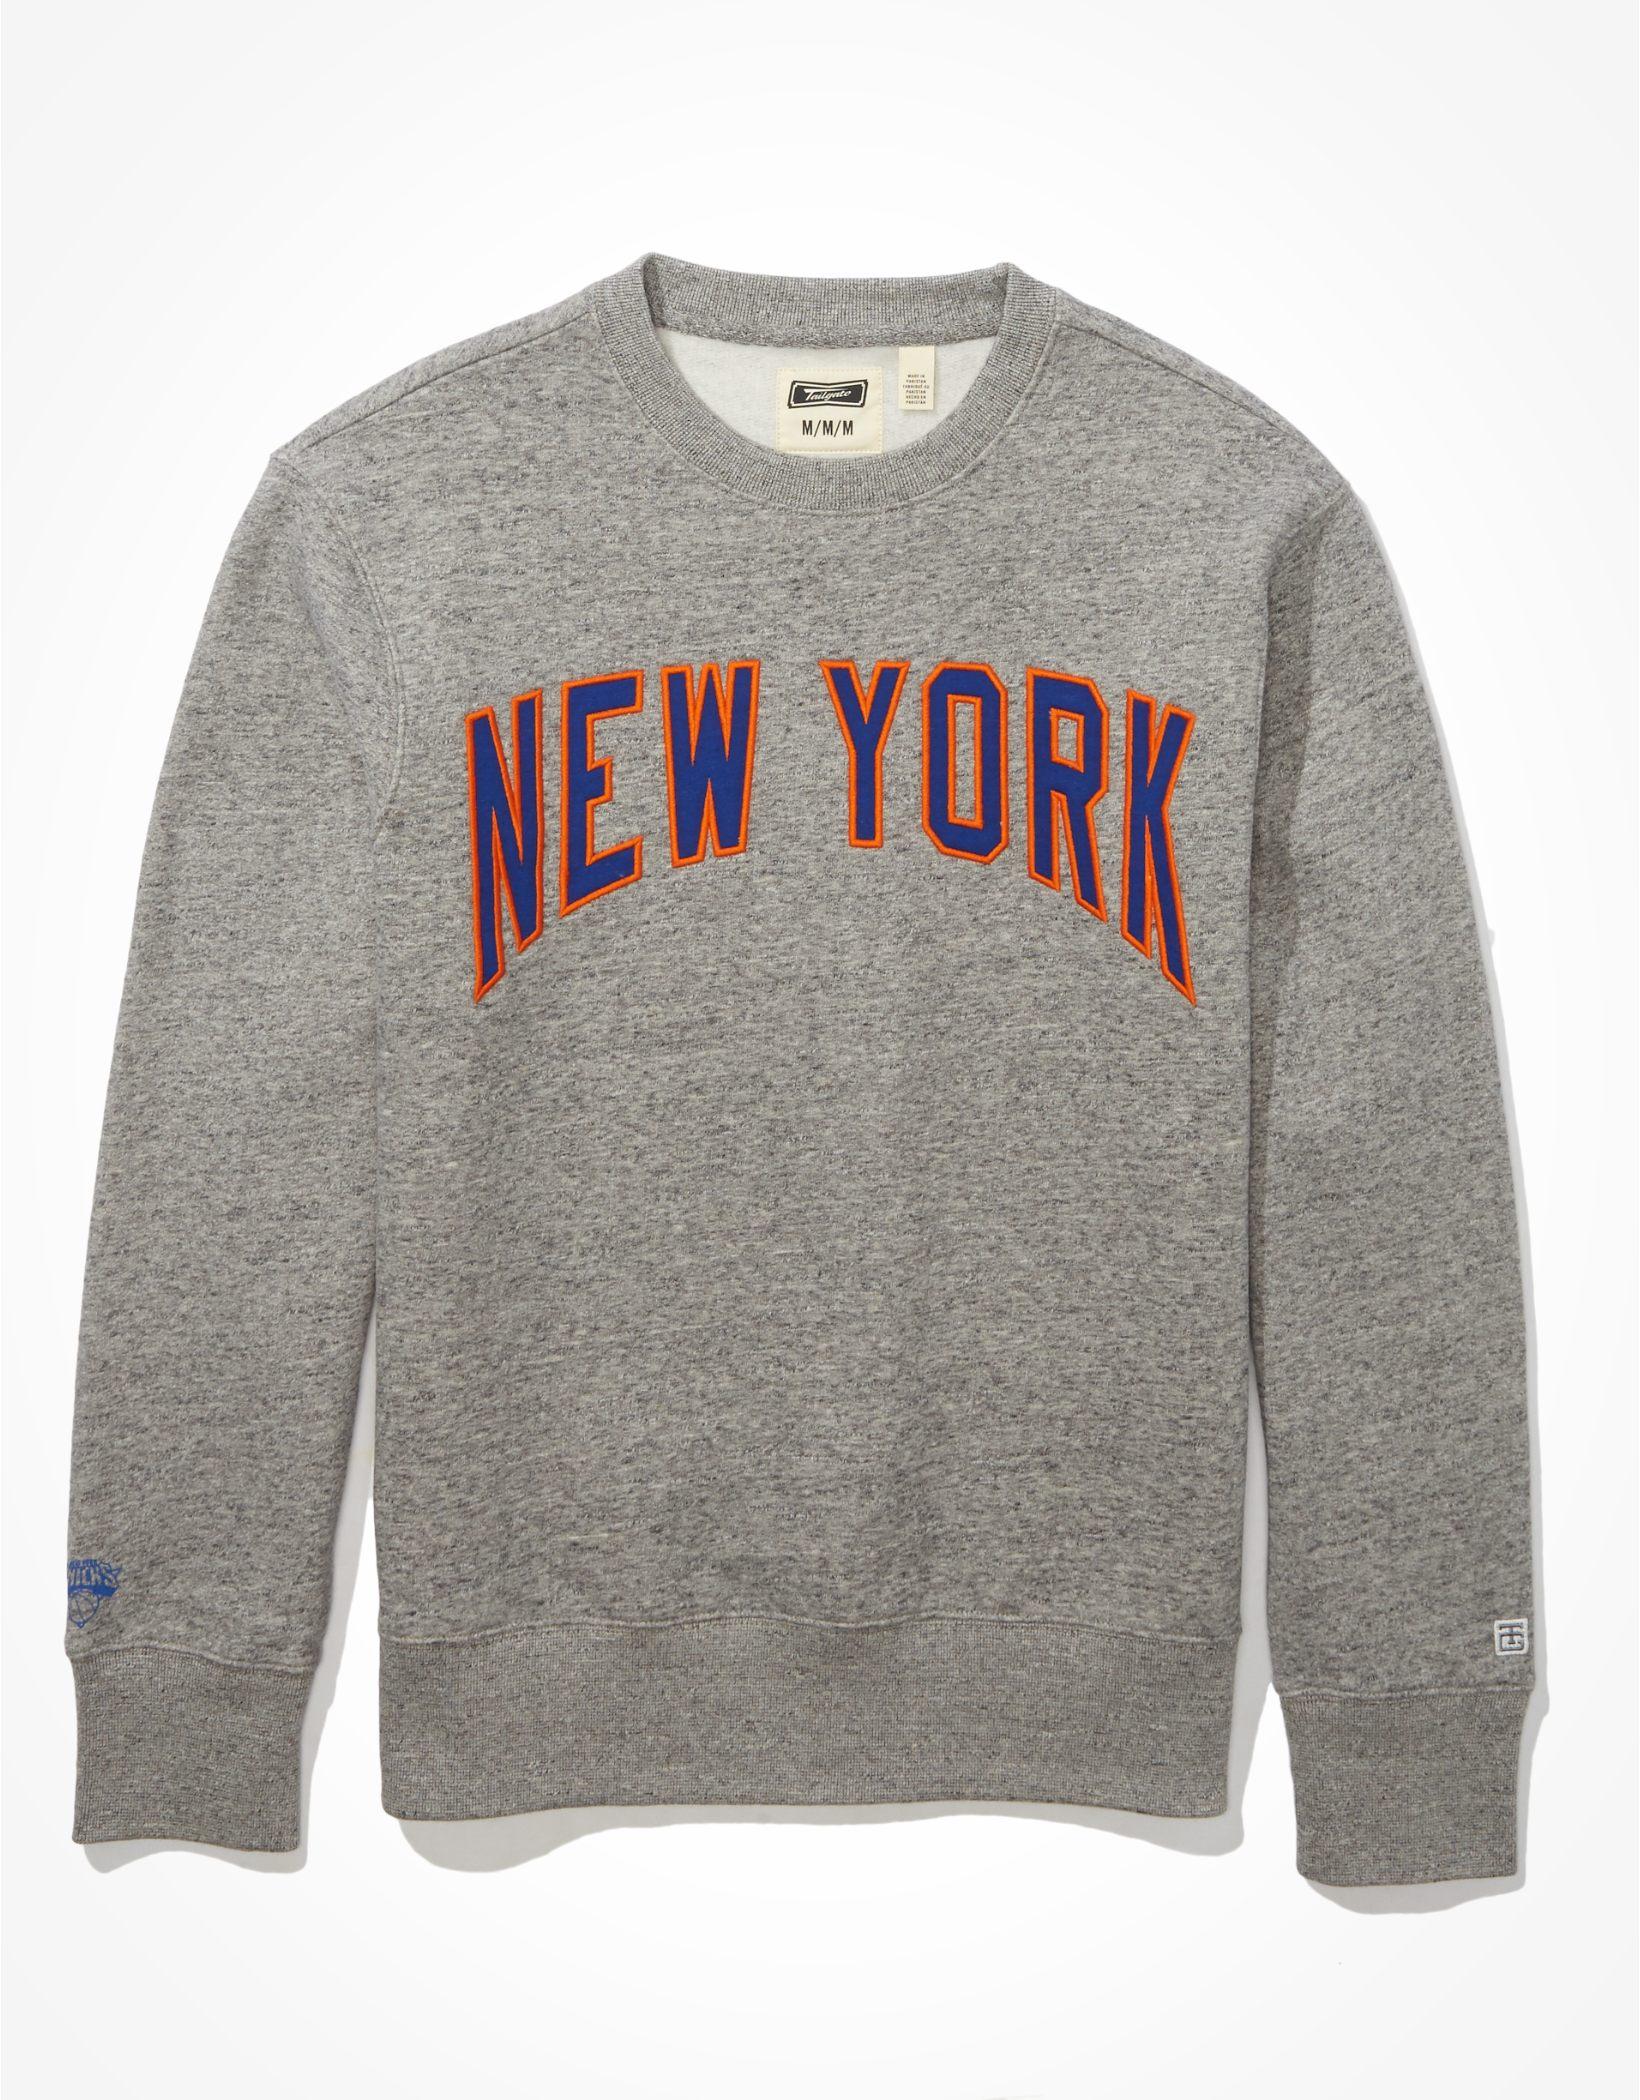 Tailgate Men's New York Knicks Fleece Sweatshirt